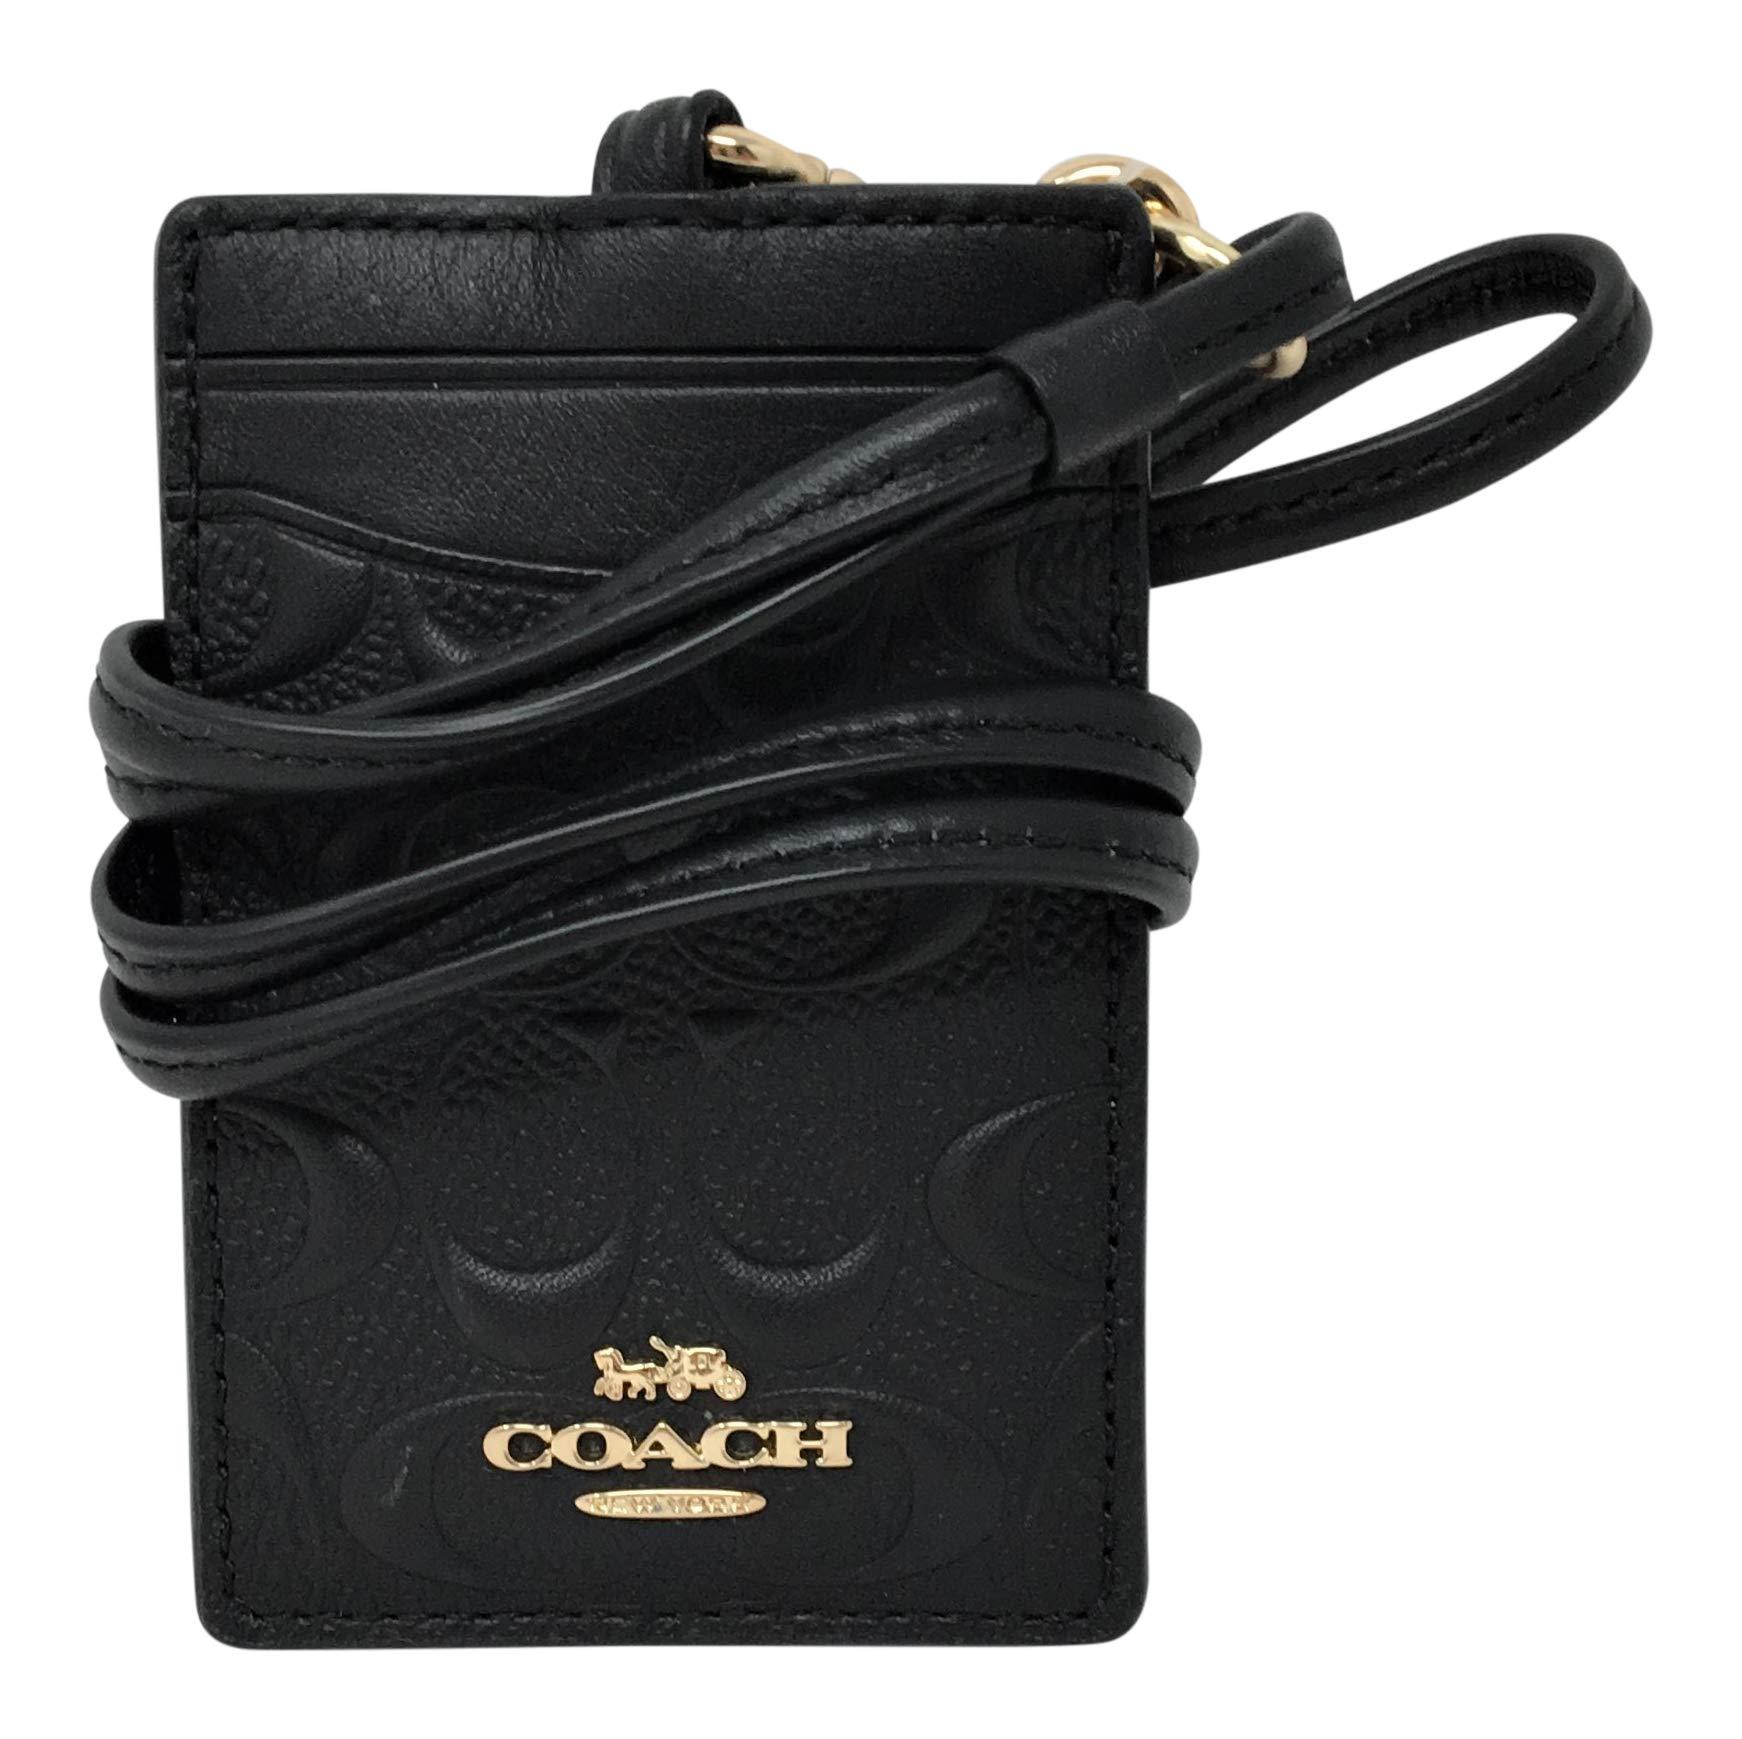 Coach Signature PVC Lanyard ID Badge Card Holder Black F73602 by Coach